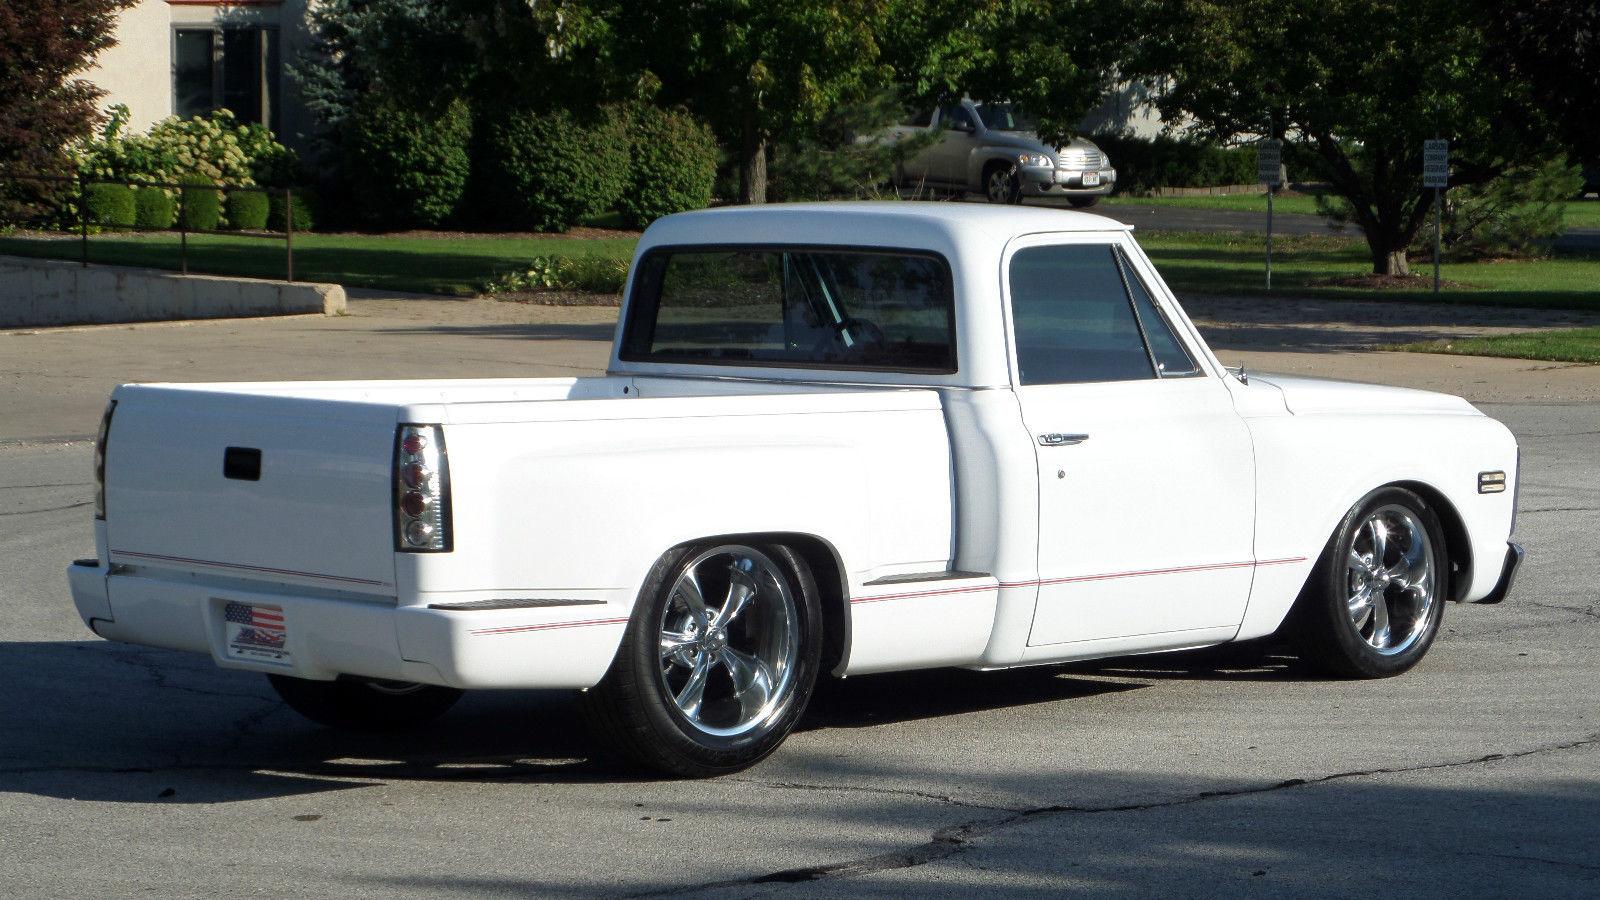 hight resolution of 1972 chevrolet c10 custom stepside shortbed 66 67 68 69 70 71 ready for shows